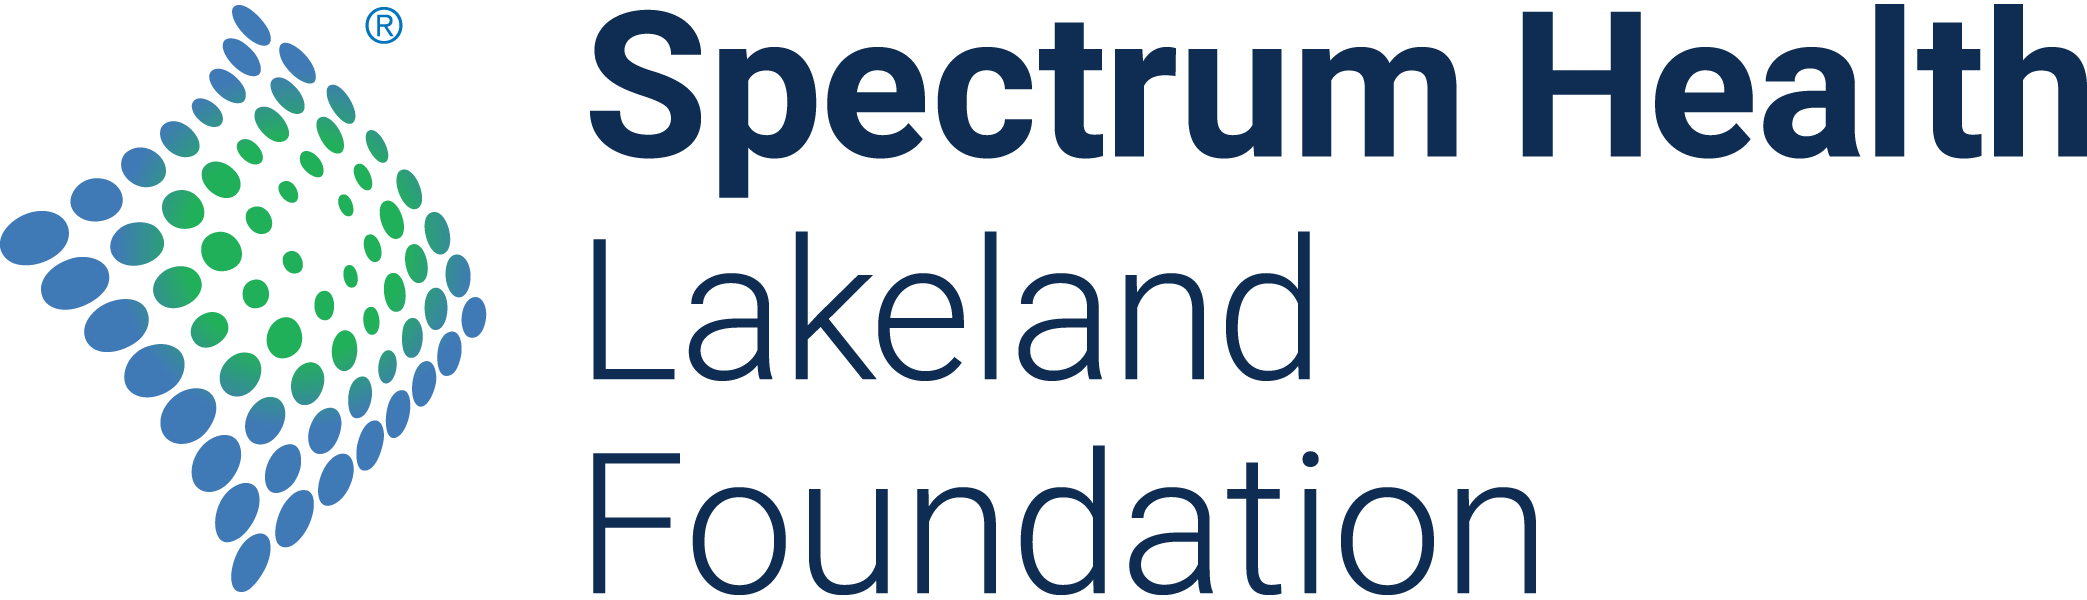 Spectrum Health Lakeland Foundation